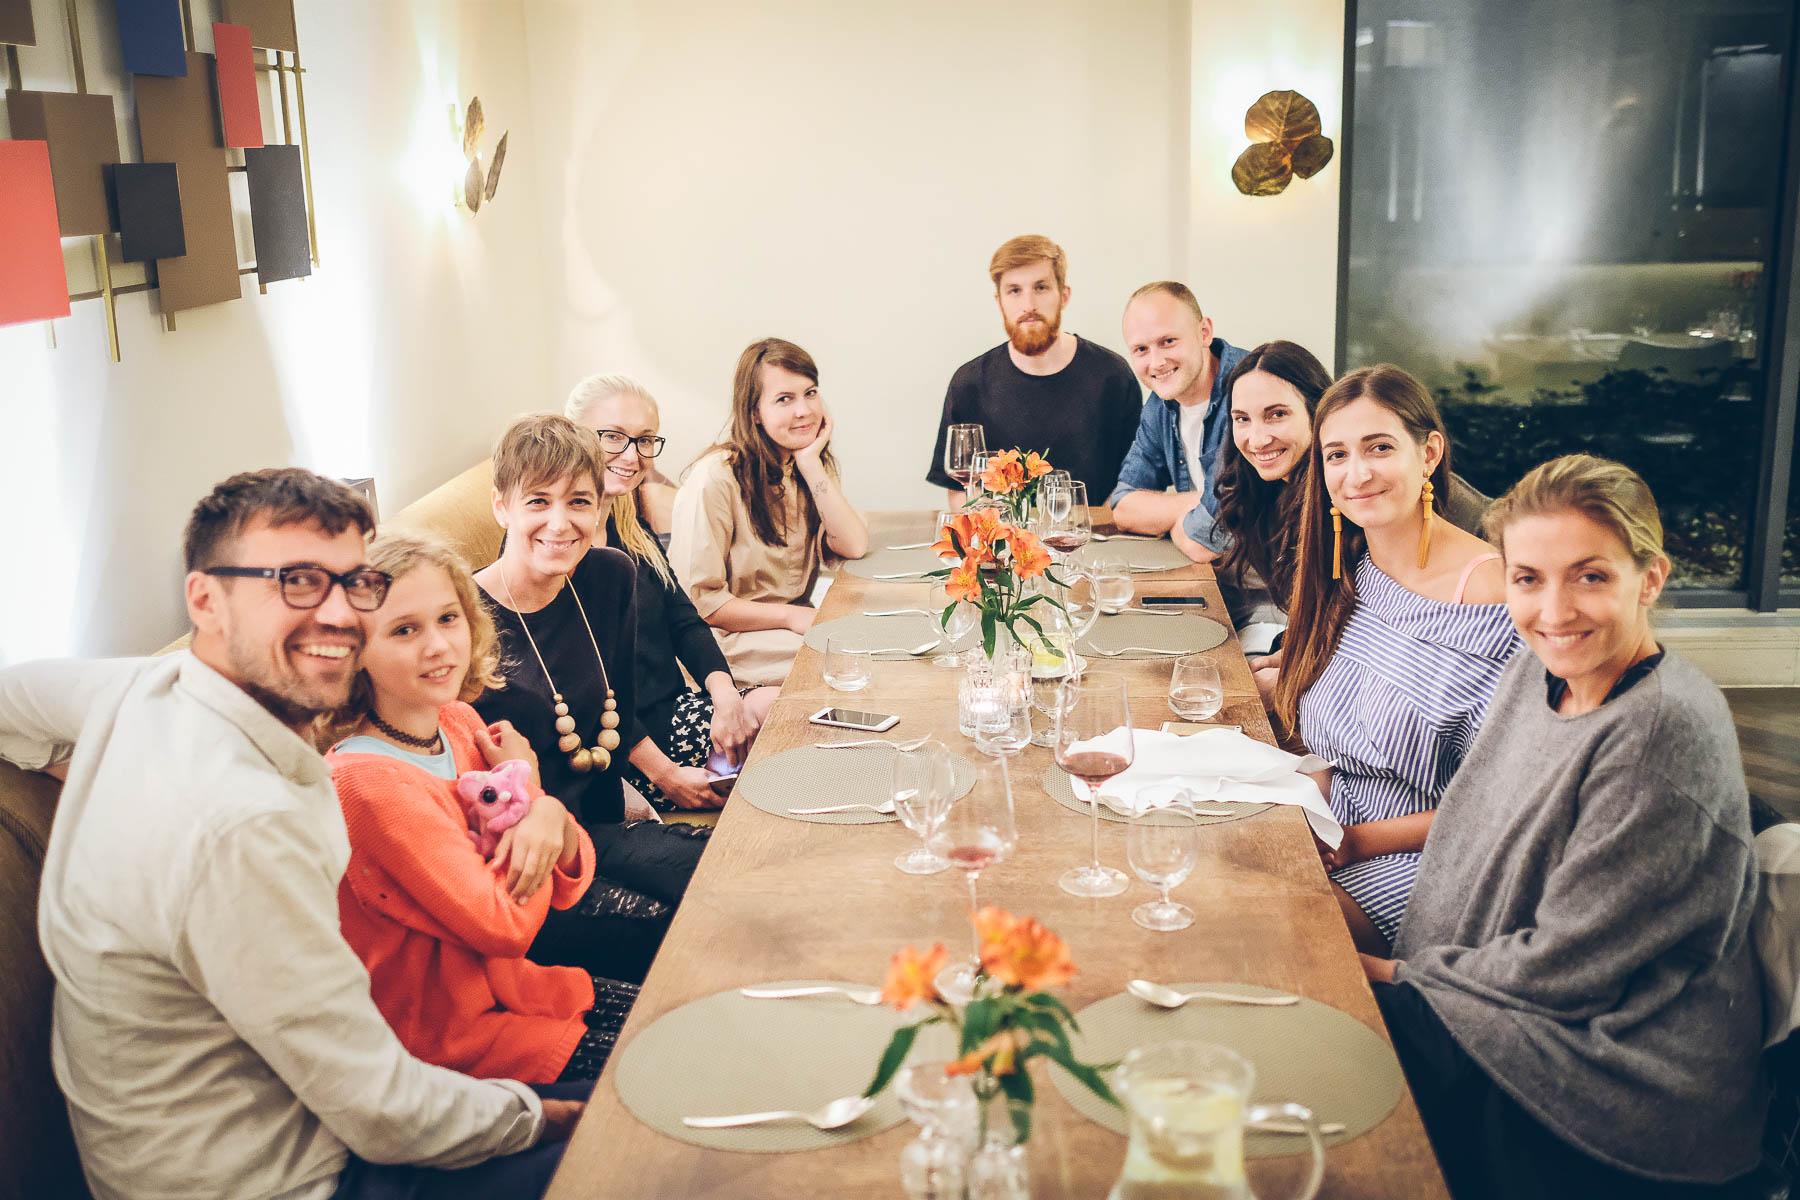 Na večeři uMarka Fichtnera vAugustine Restaurant